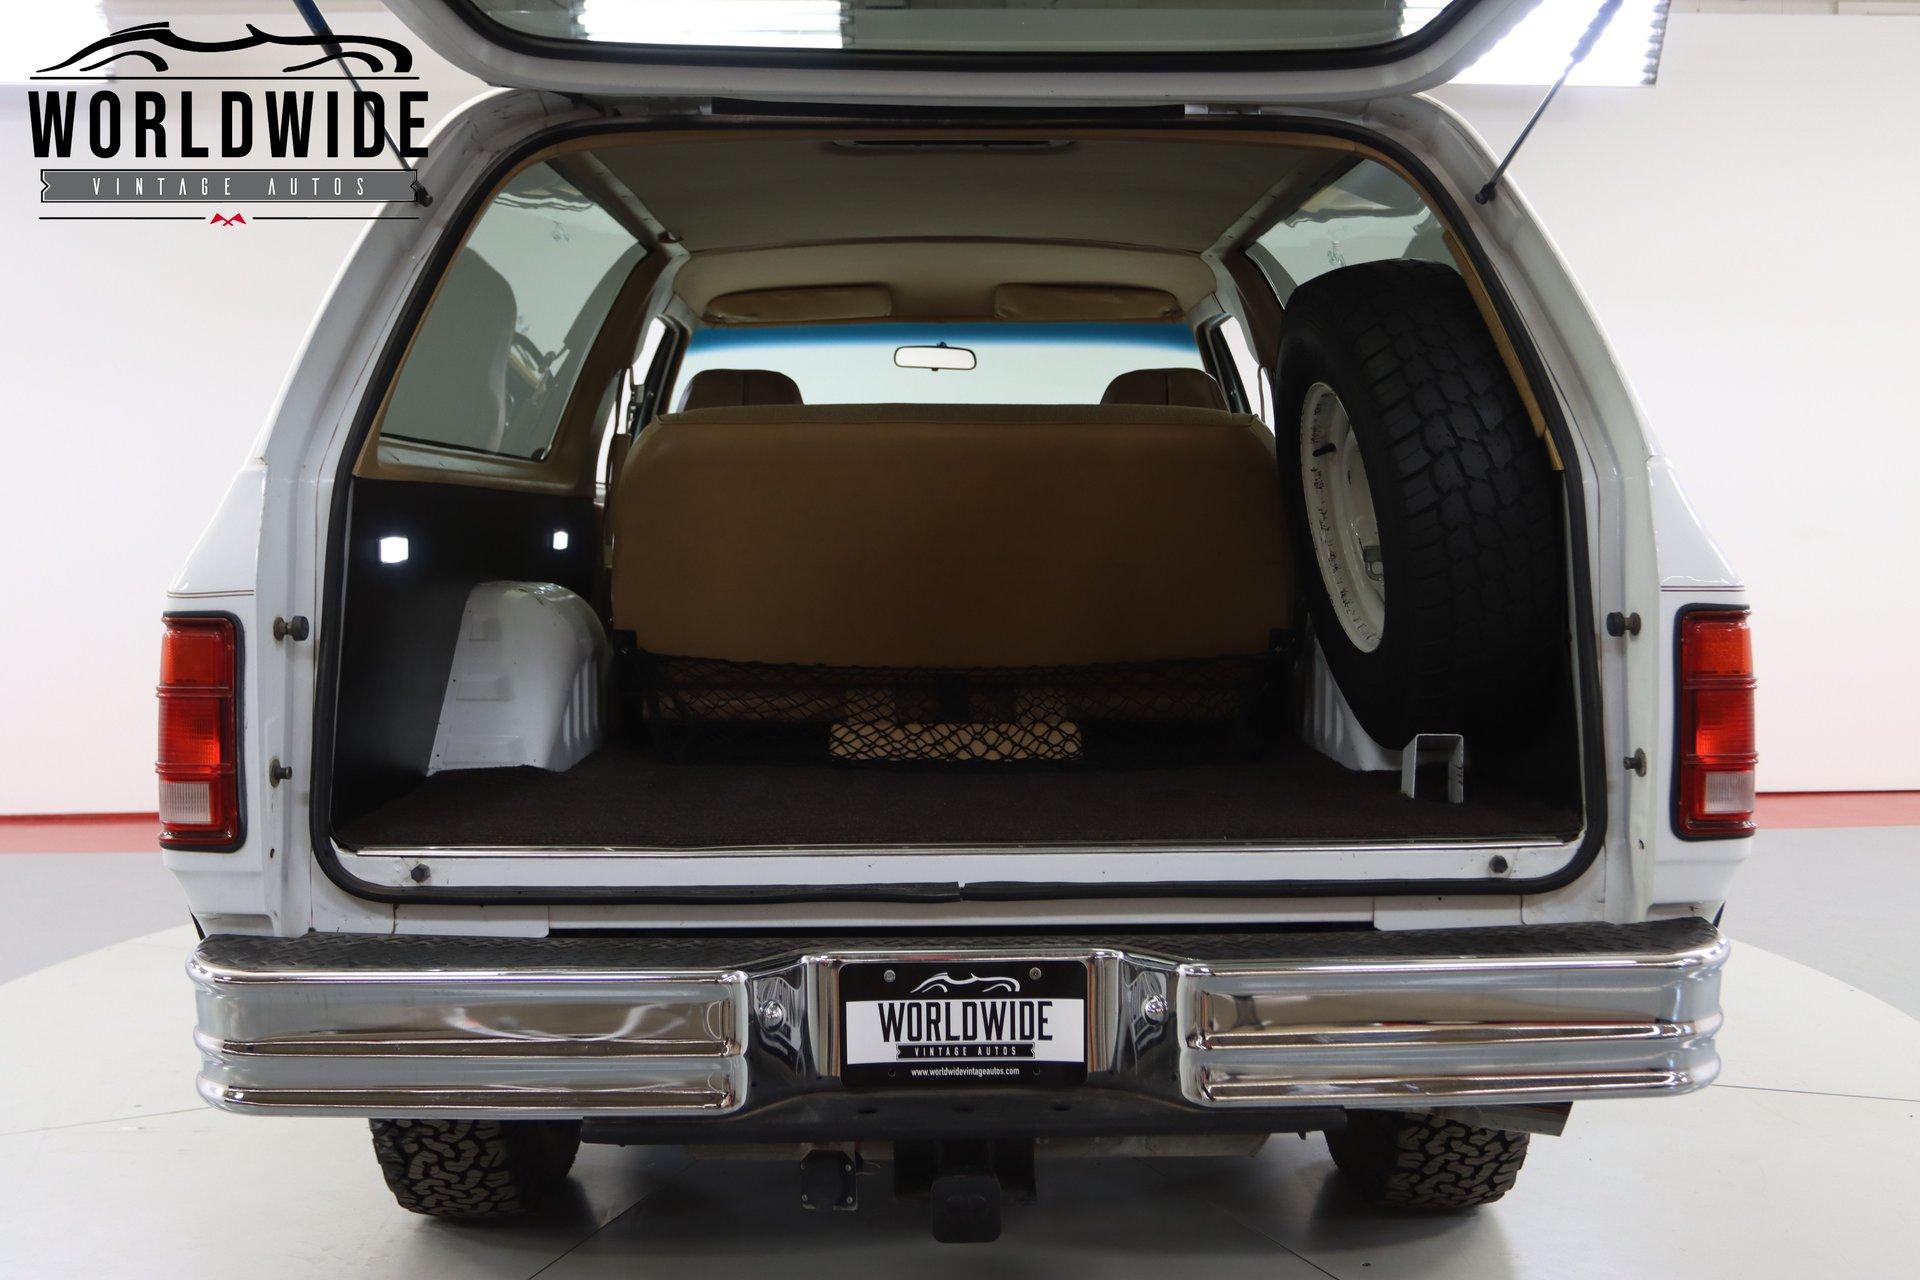 1989 Dodge Ram Charger Prospector